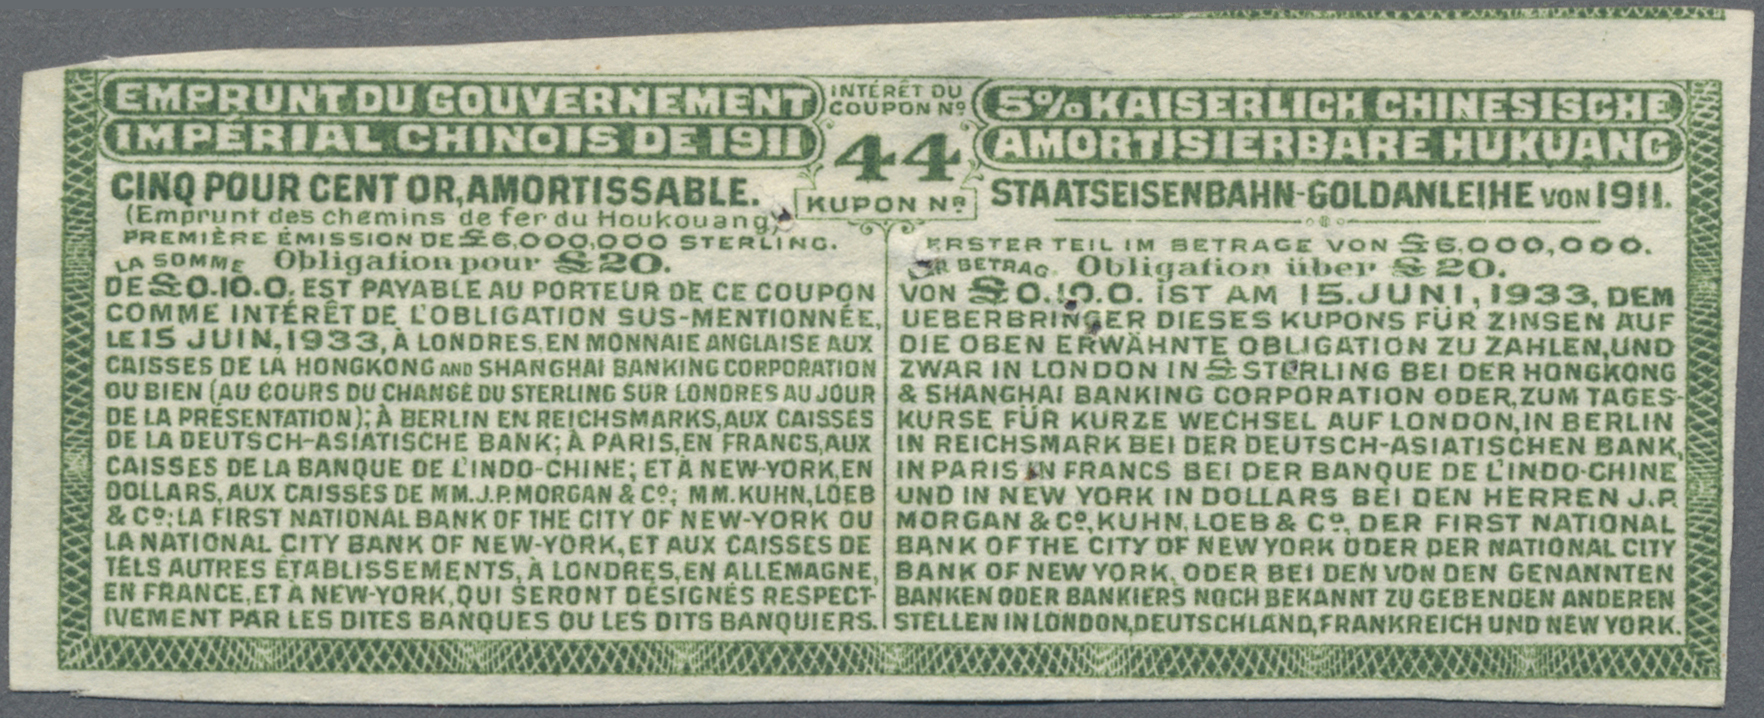 Lot 00140 - China | Banknoten  -  Auktionshaus Christoph Gärtner GmbH & Co. KG Sale #48 The Banknotes